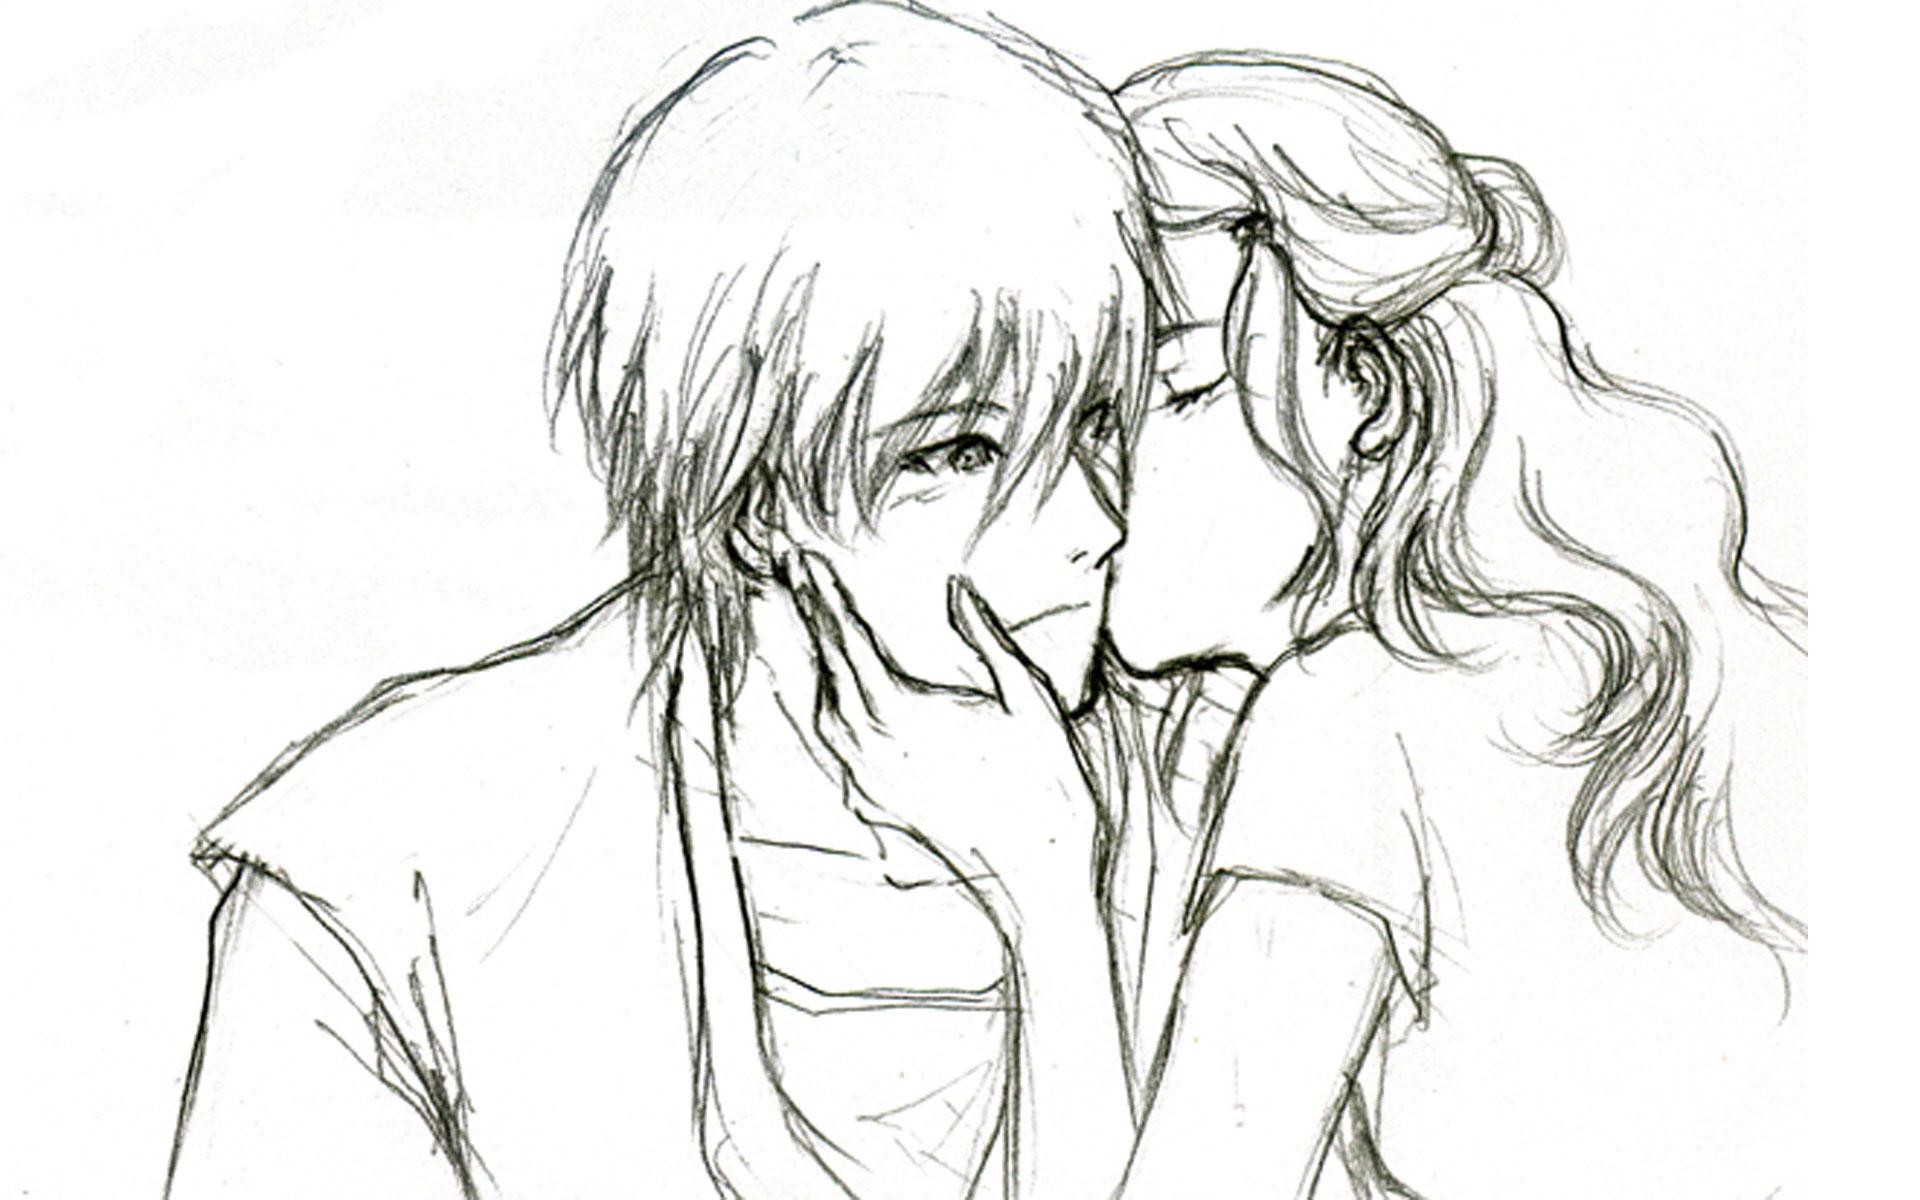 1920x1200 Alone Sad Boy Drawing Pencil Image Alone Sad Boy In Love